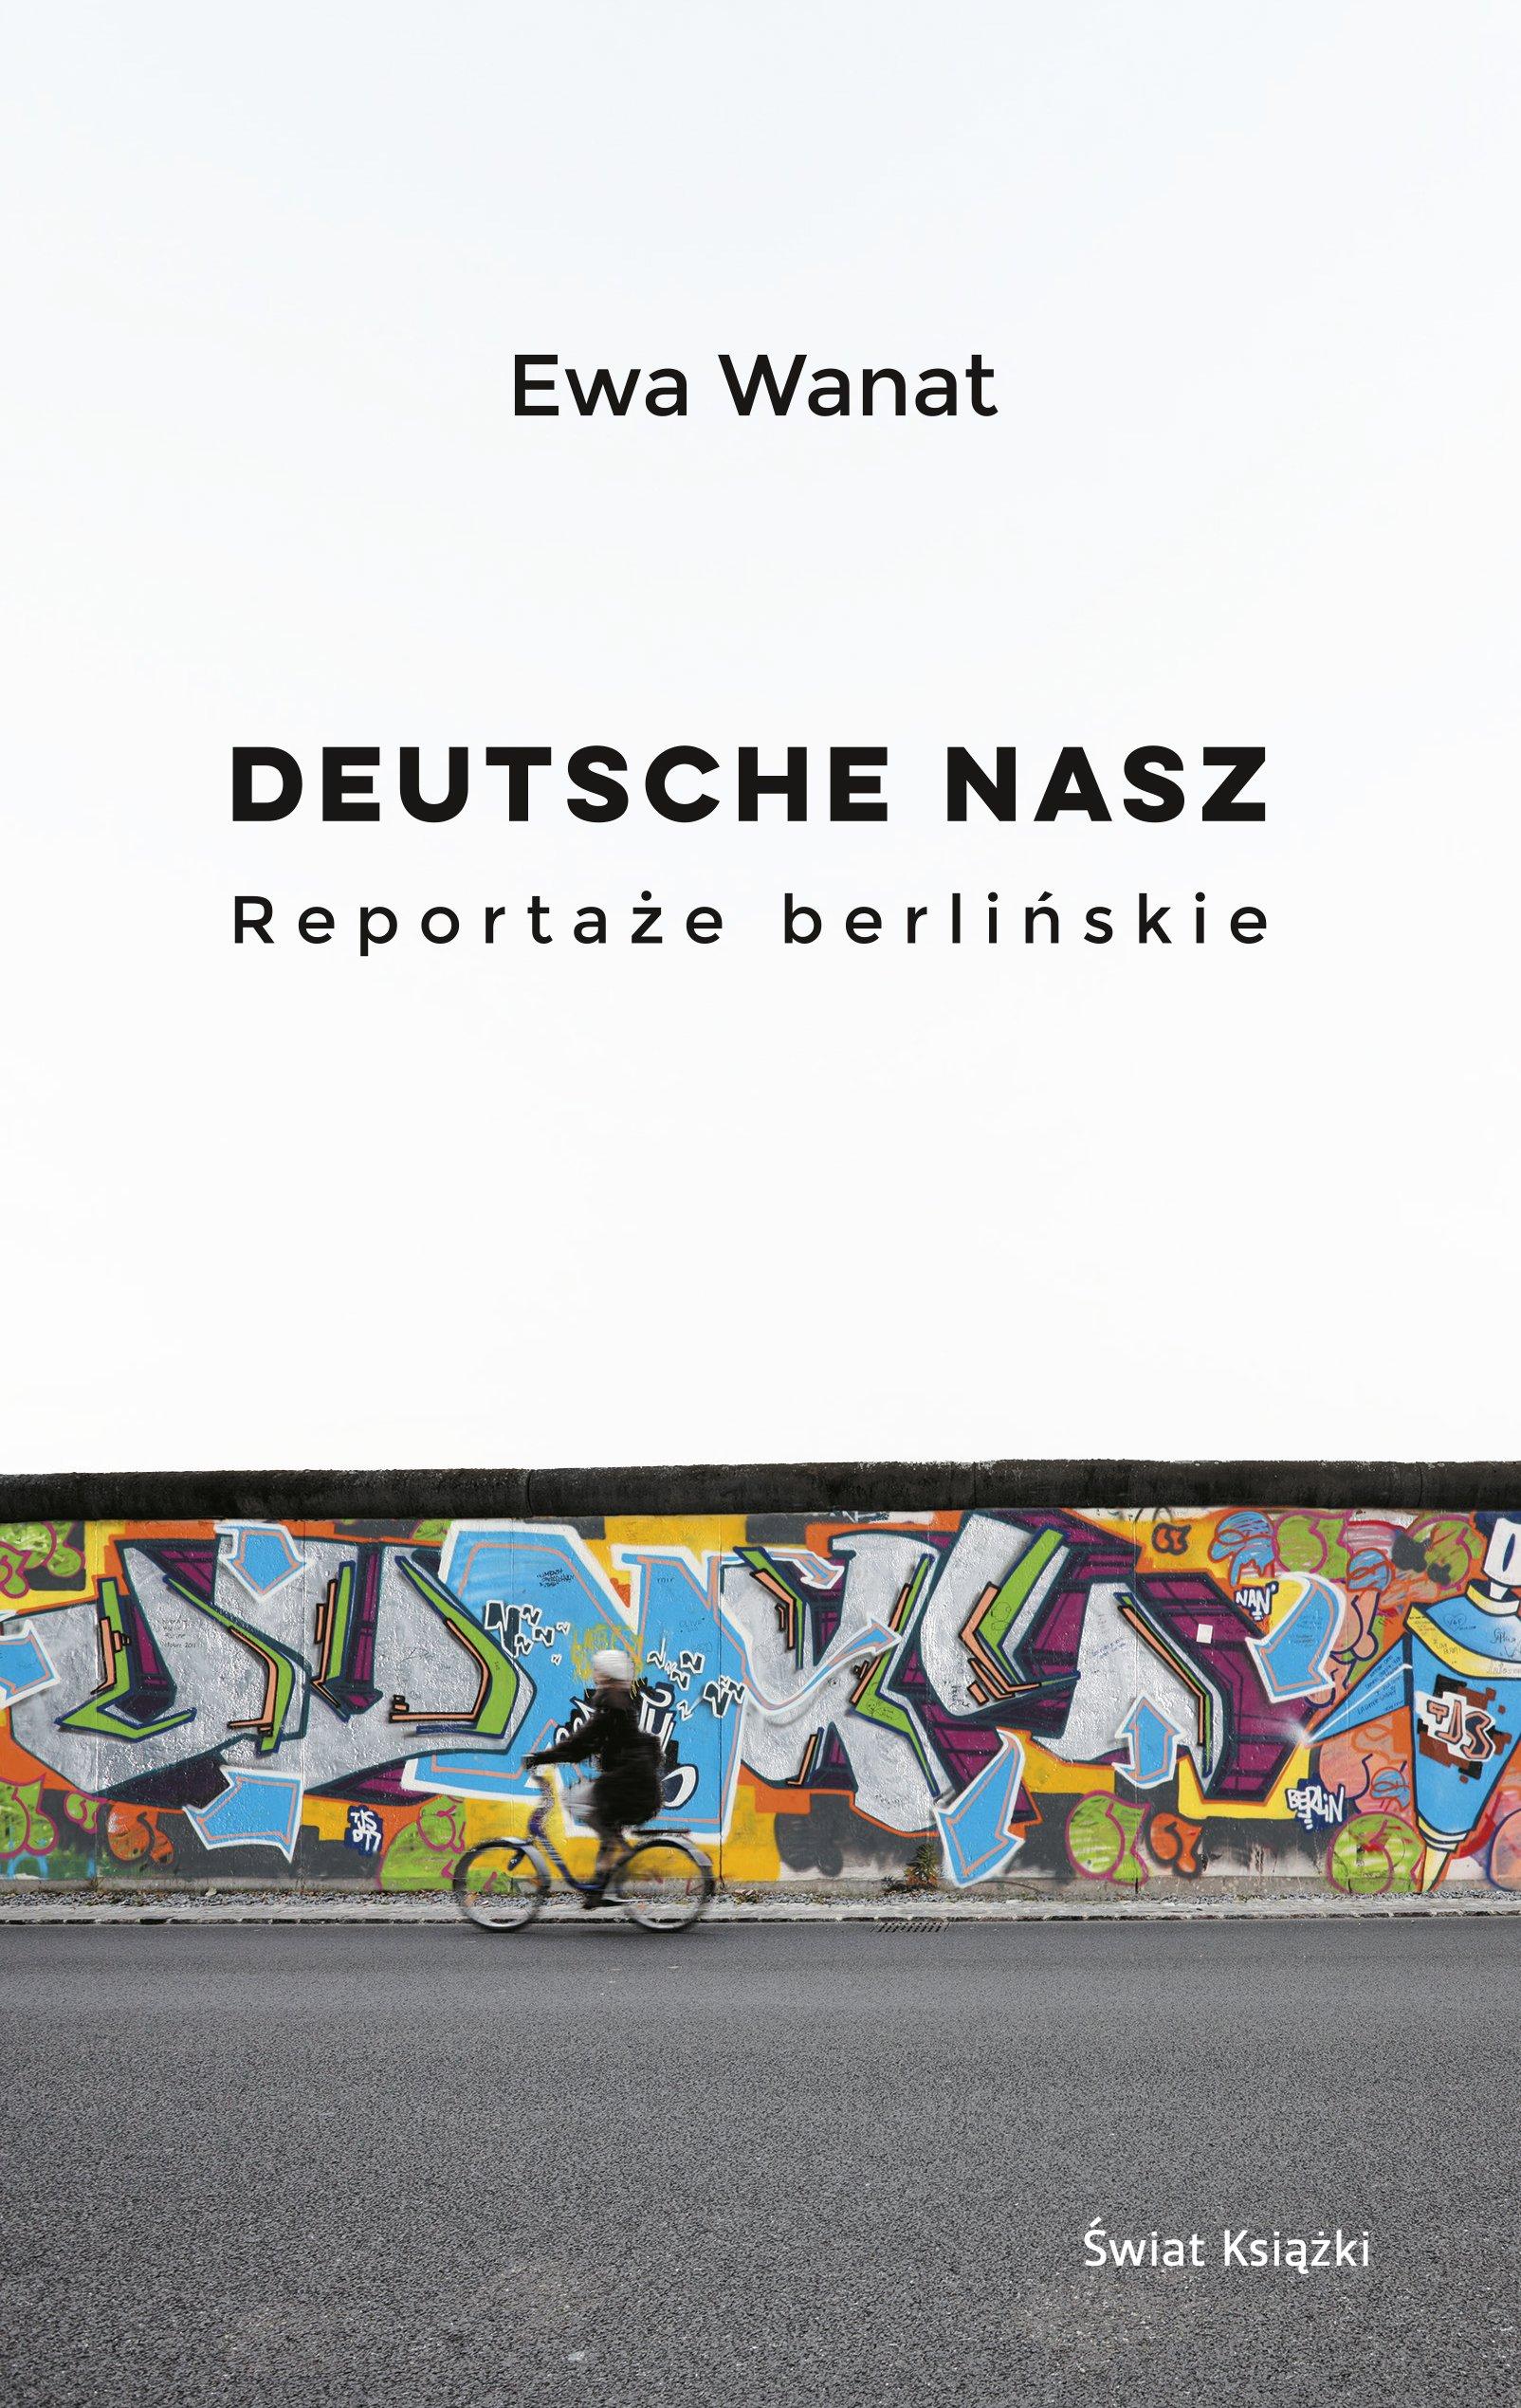 Deutsche nasz Reportaze berlinskie